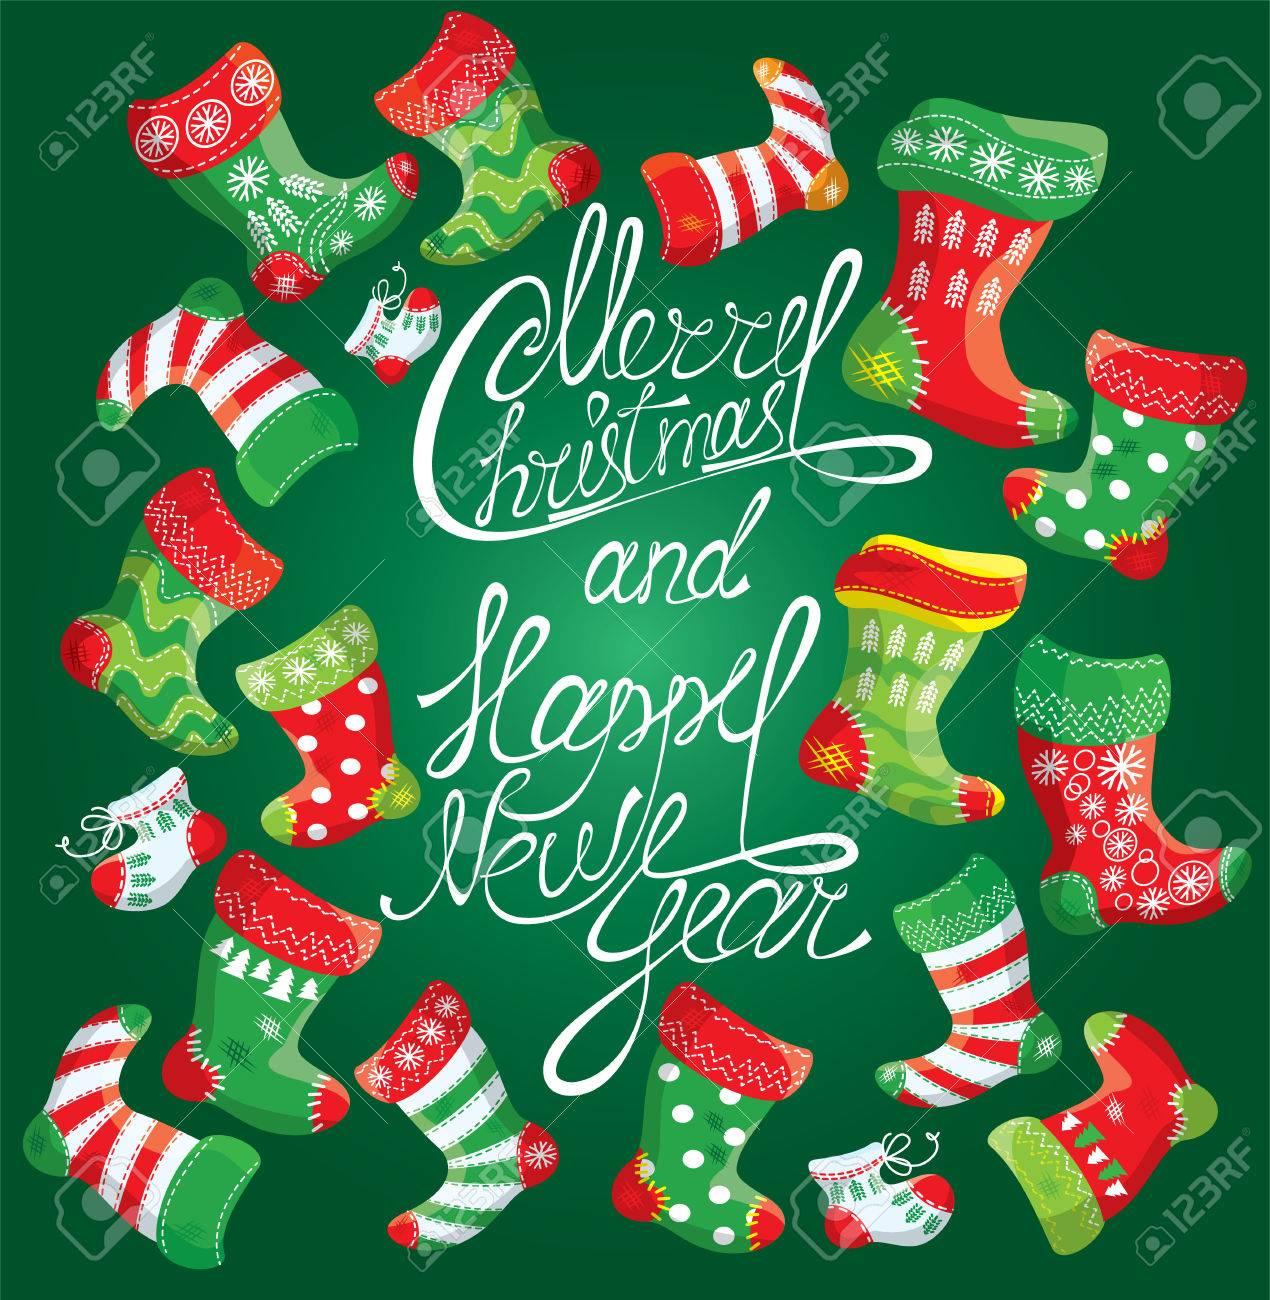 Family Christmas Stockings.X Mas And New Year Card With Family Christmas Stockings